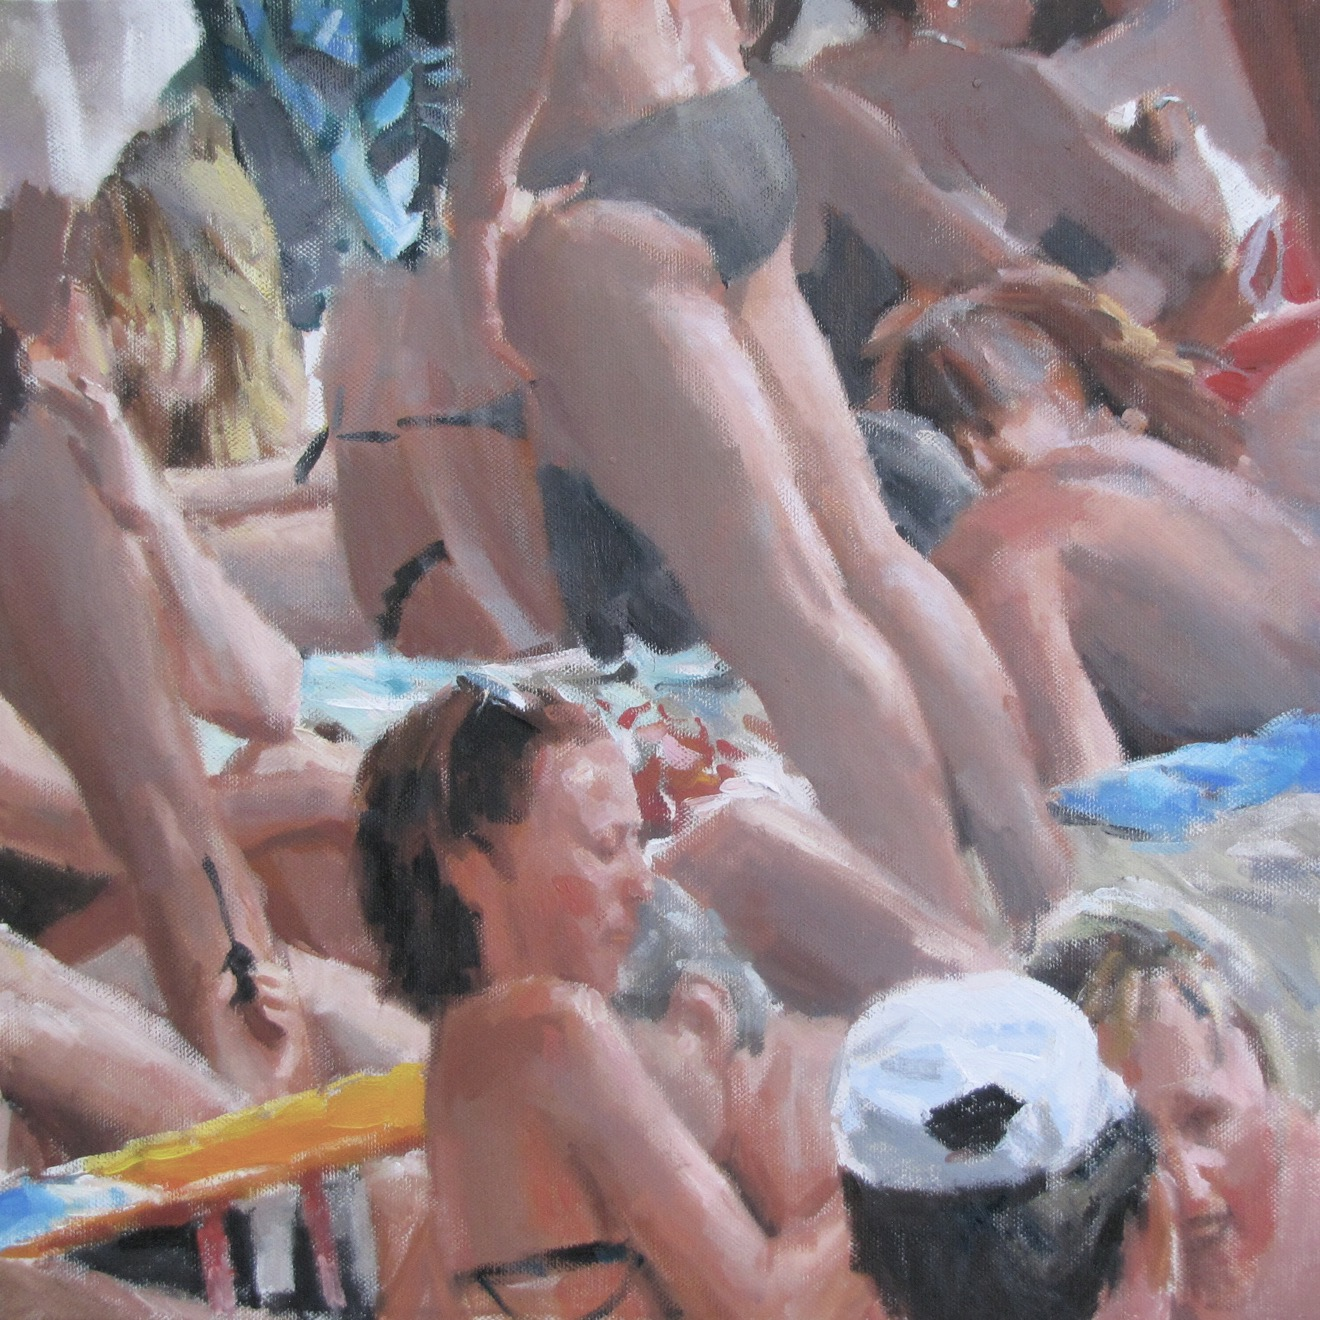 Bagnanti, di Andrea Mancini. Olio su tela, cm 40x40